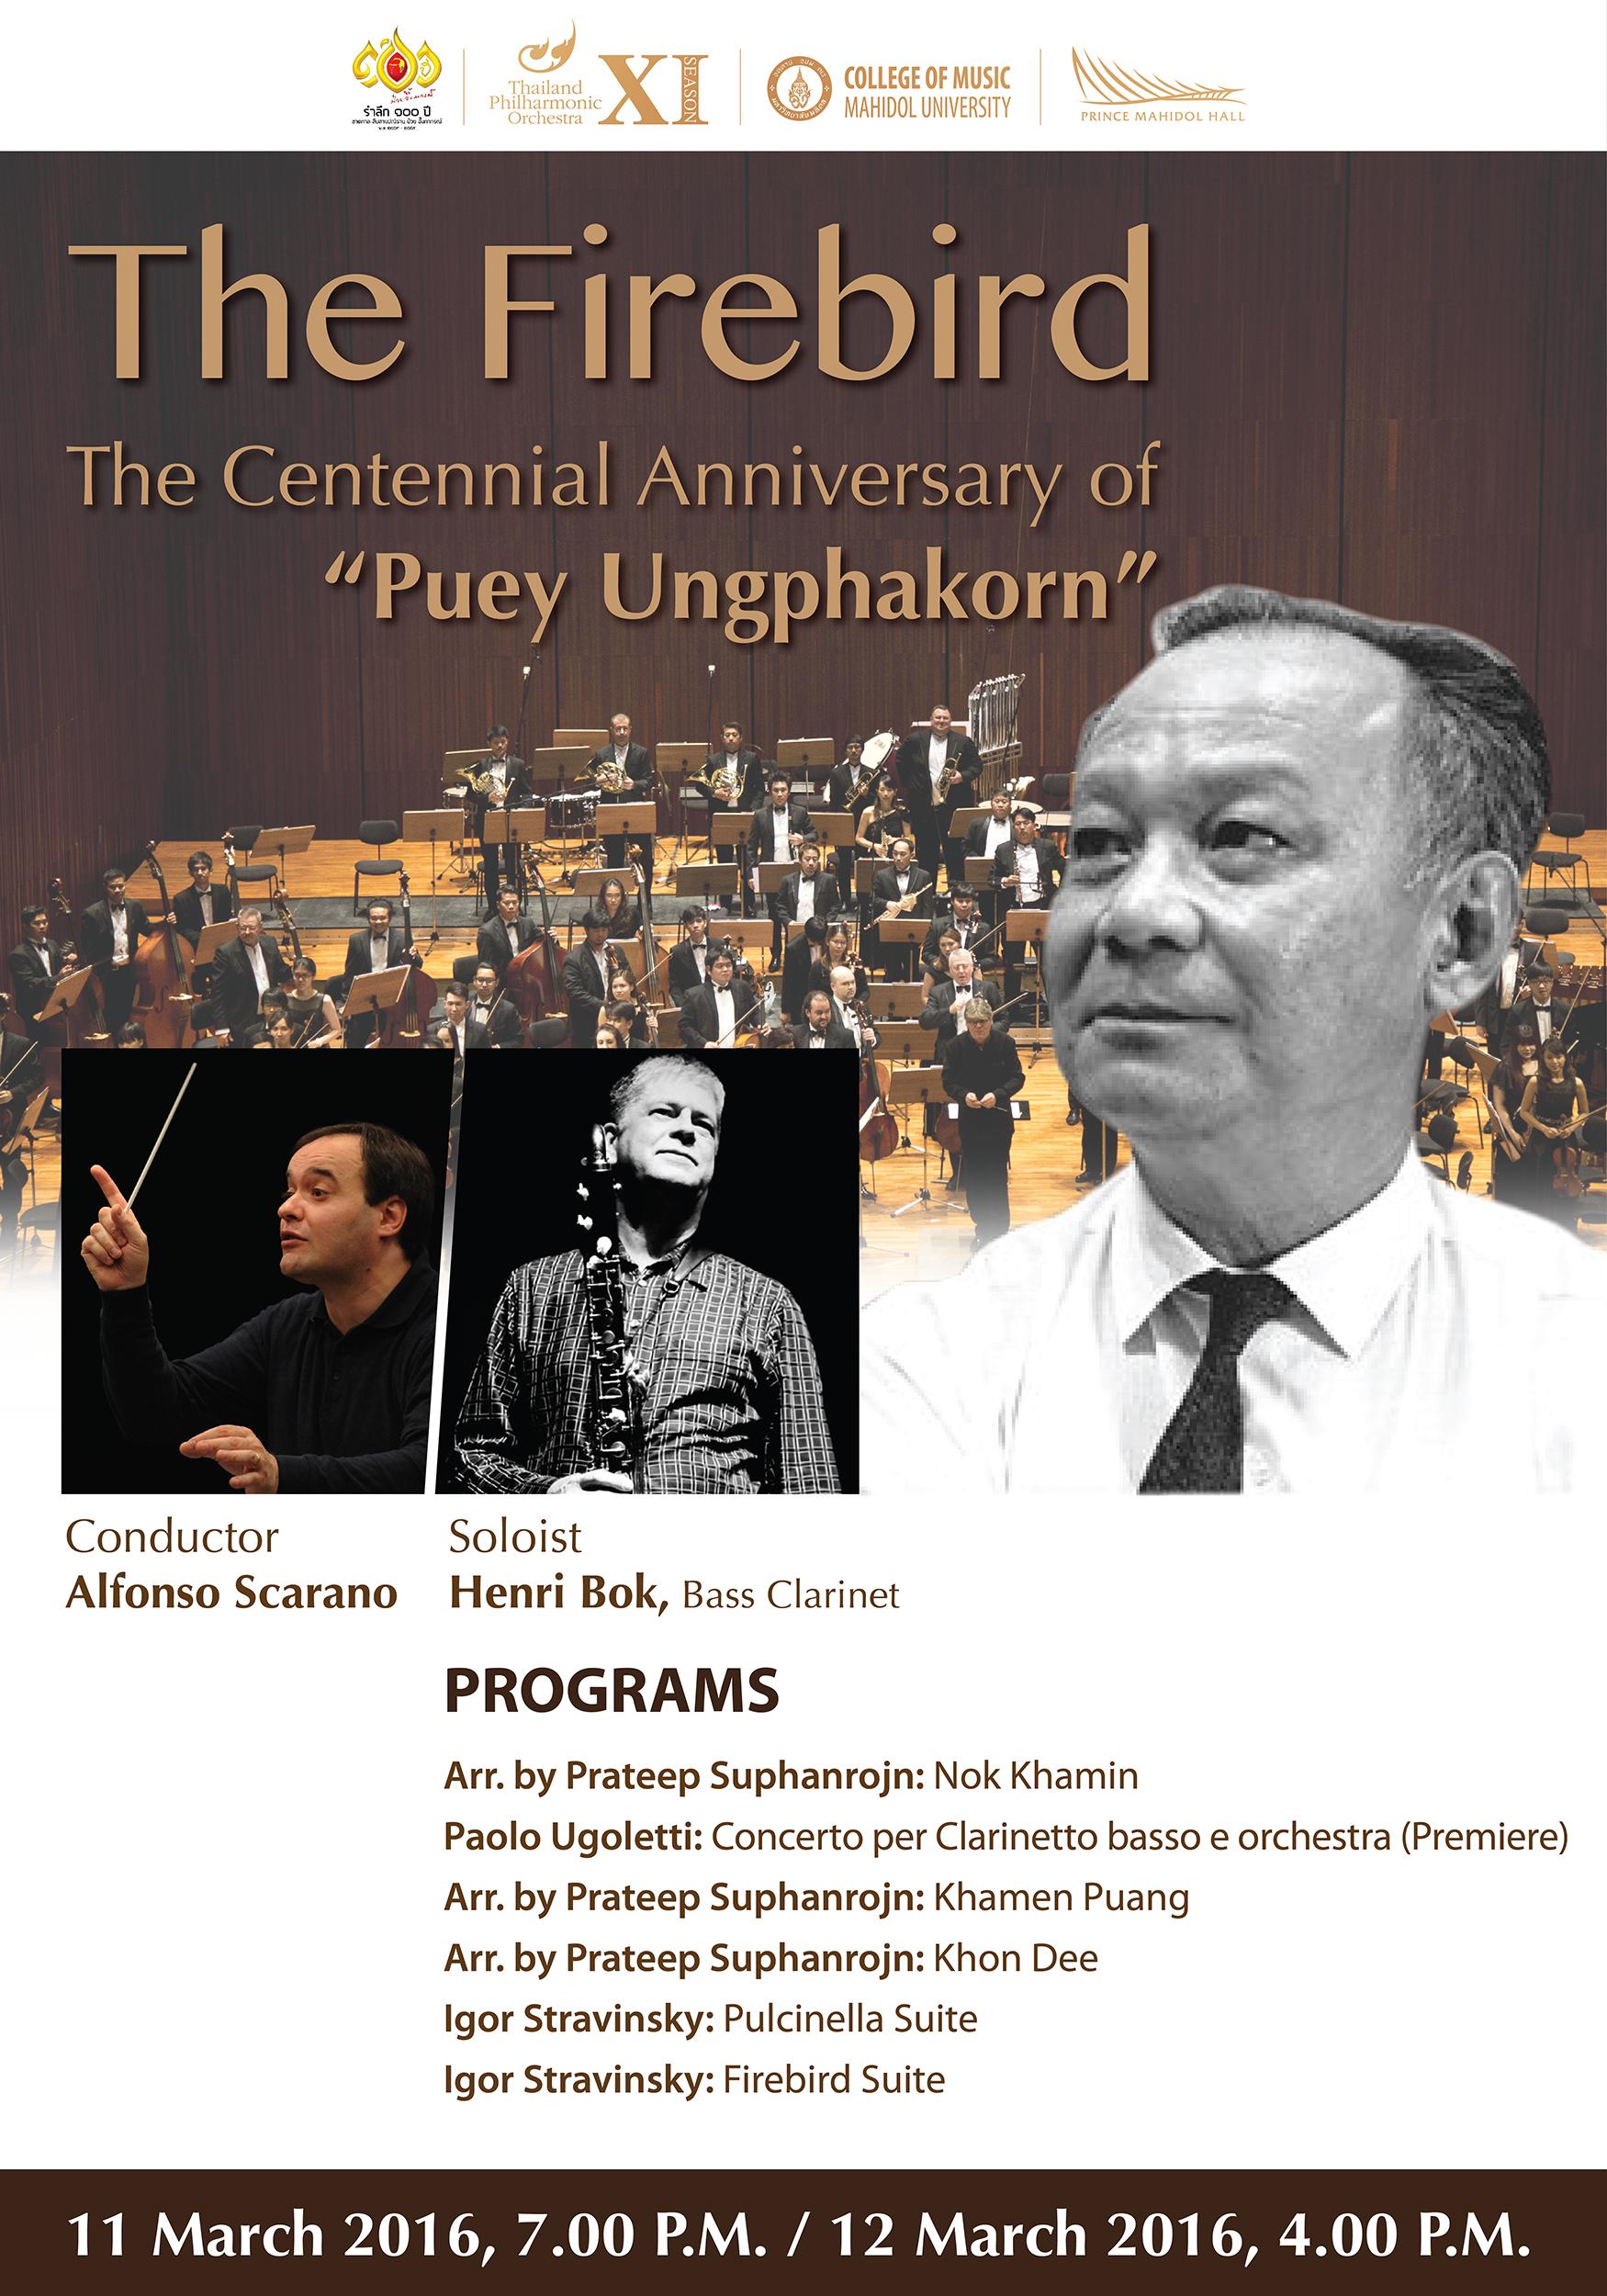 The Firebird – The Centennial Anniversary of Puey Ungphakorn